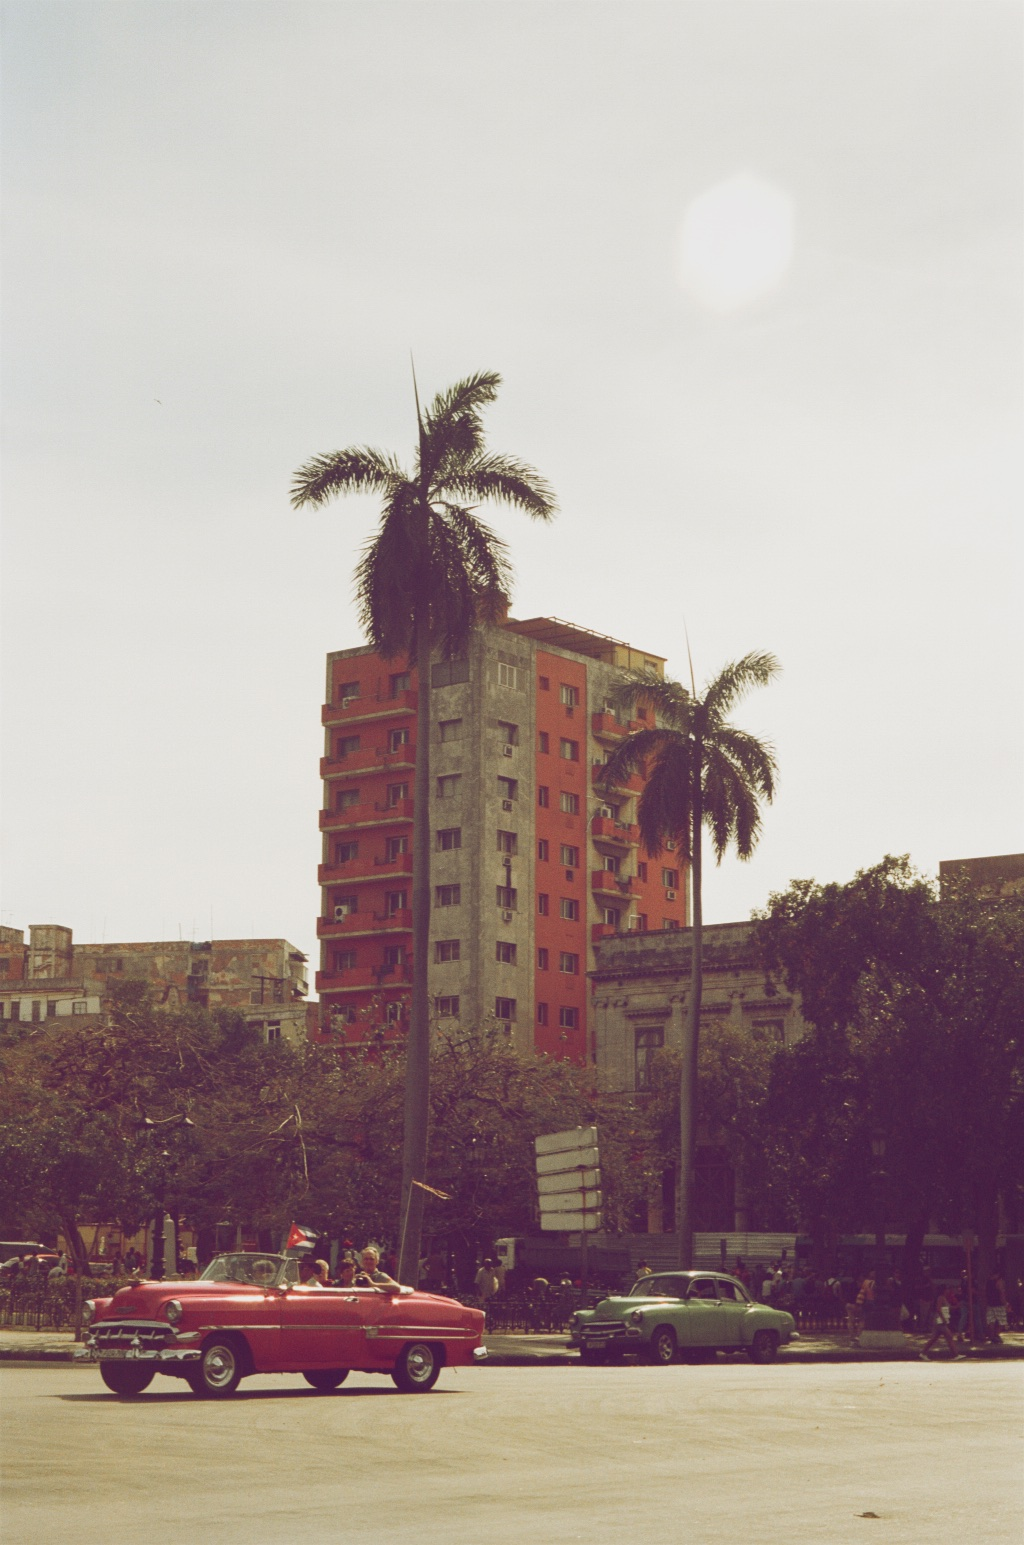 058_CubaStreet.jpg